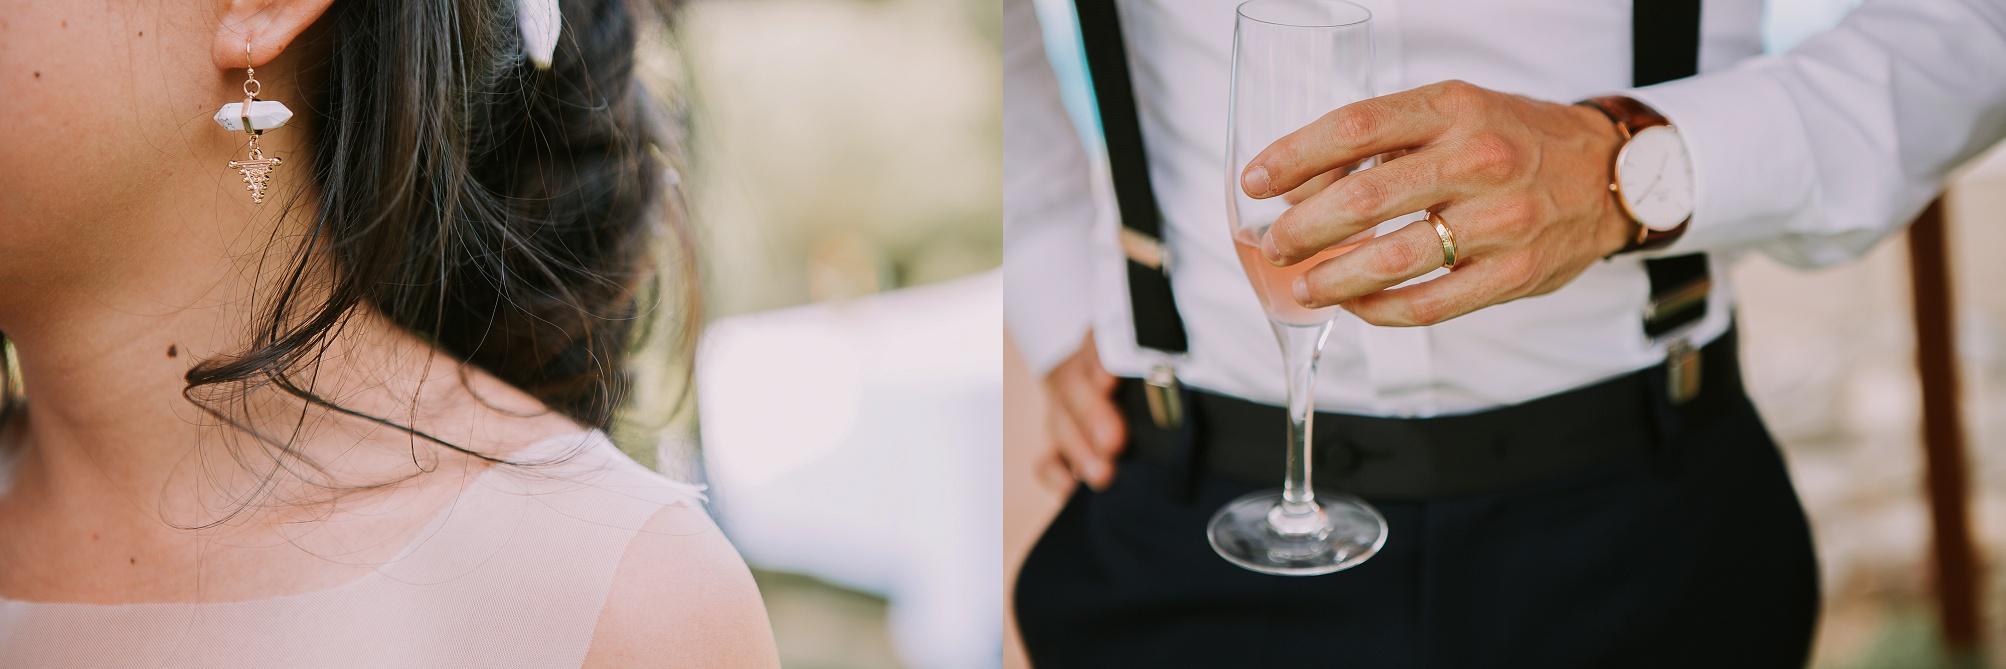 katerynaphotos-mariage-photographe-puyloubier-provence-aix-en-provence-sud-de-la-france_0414.jpg